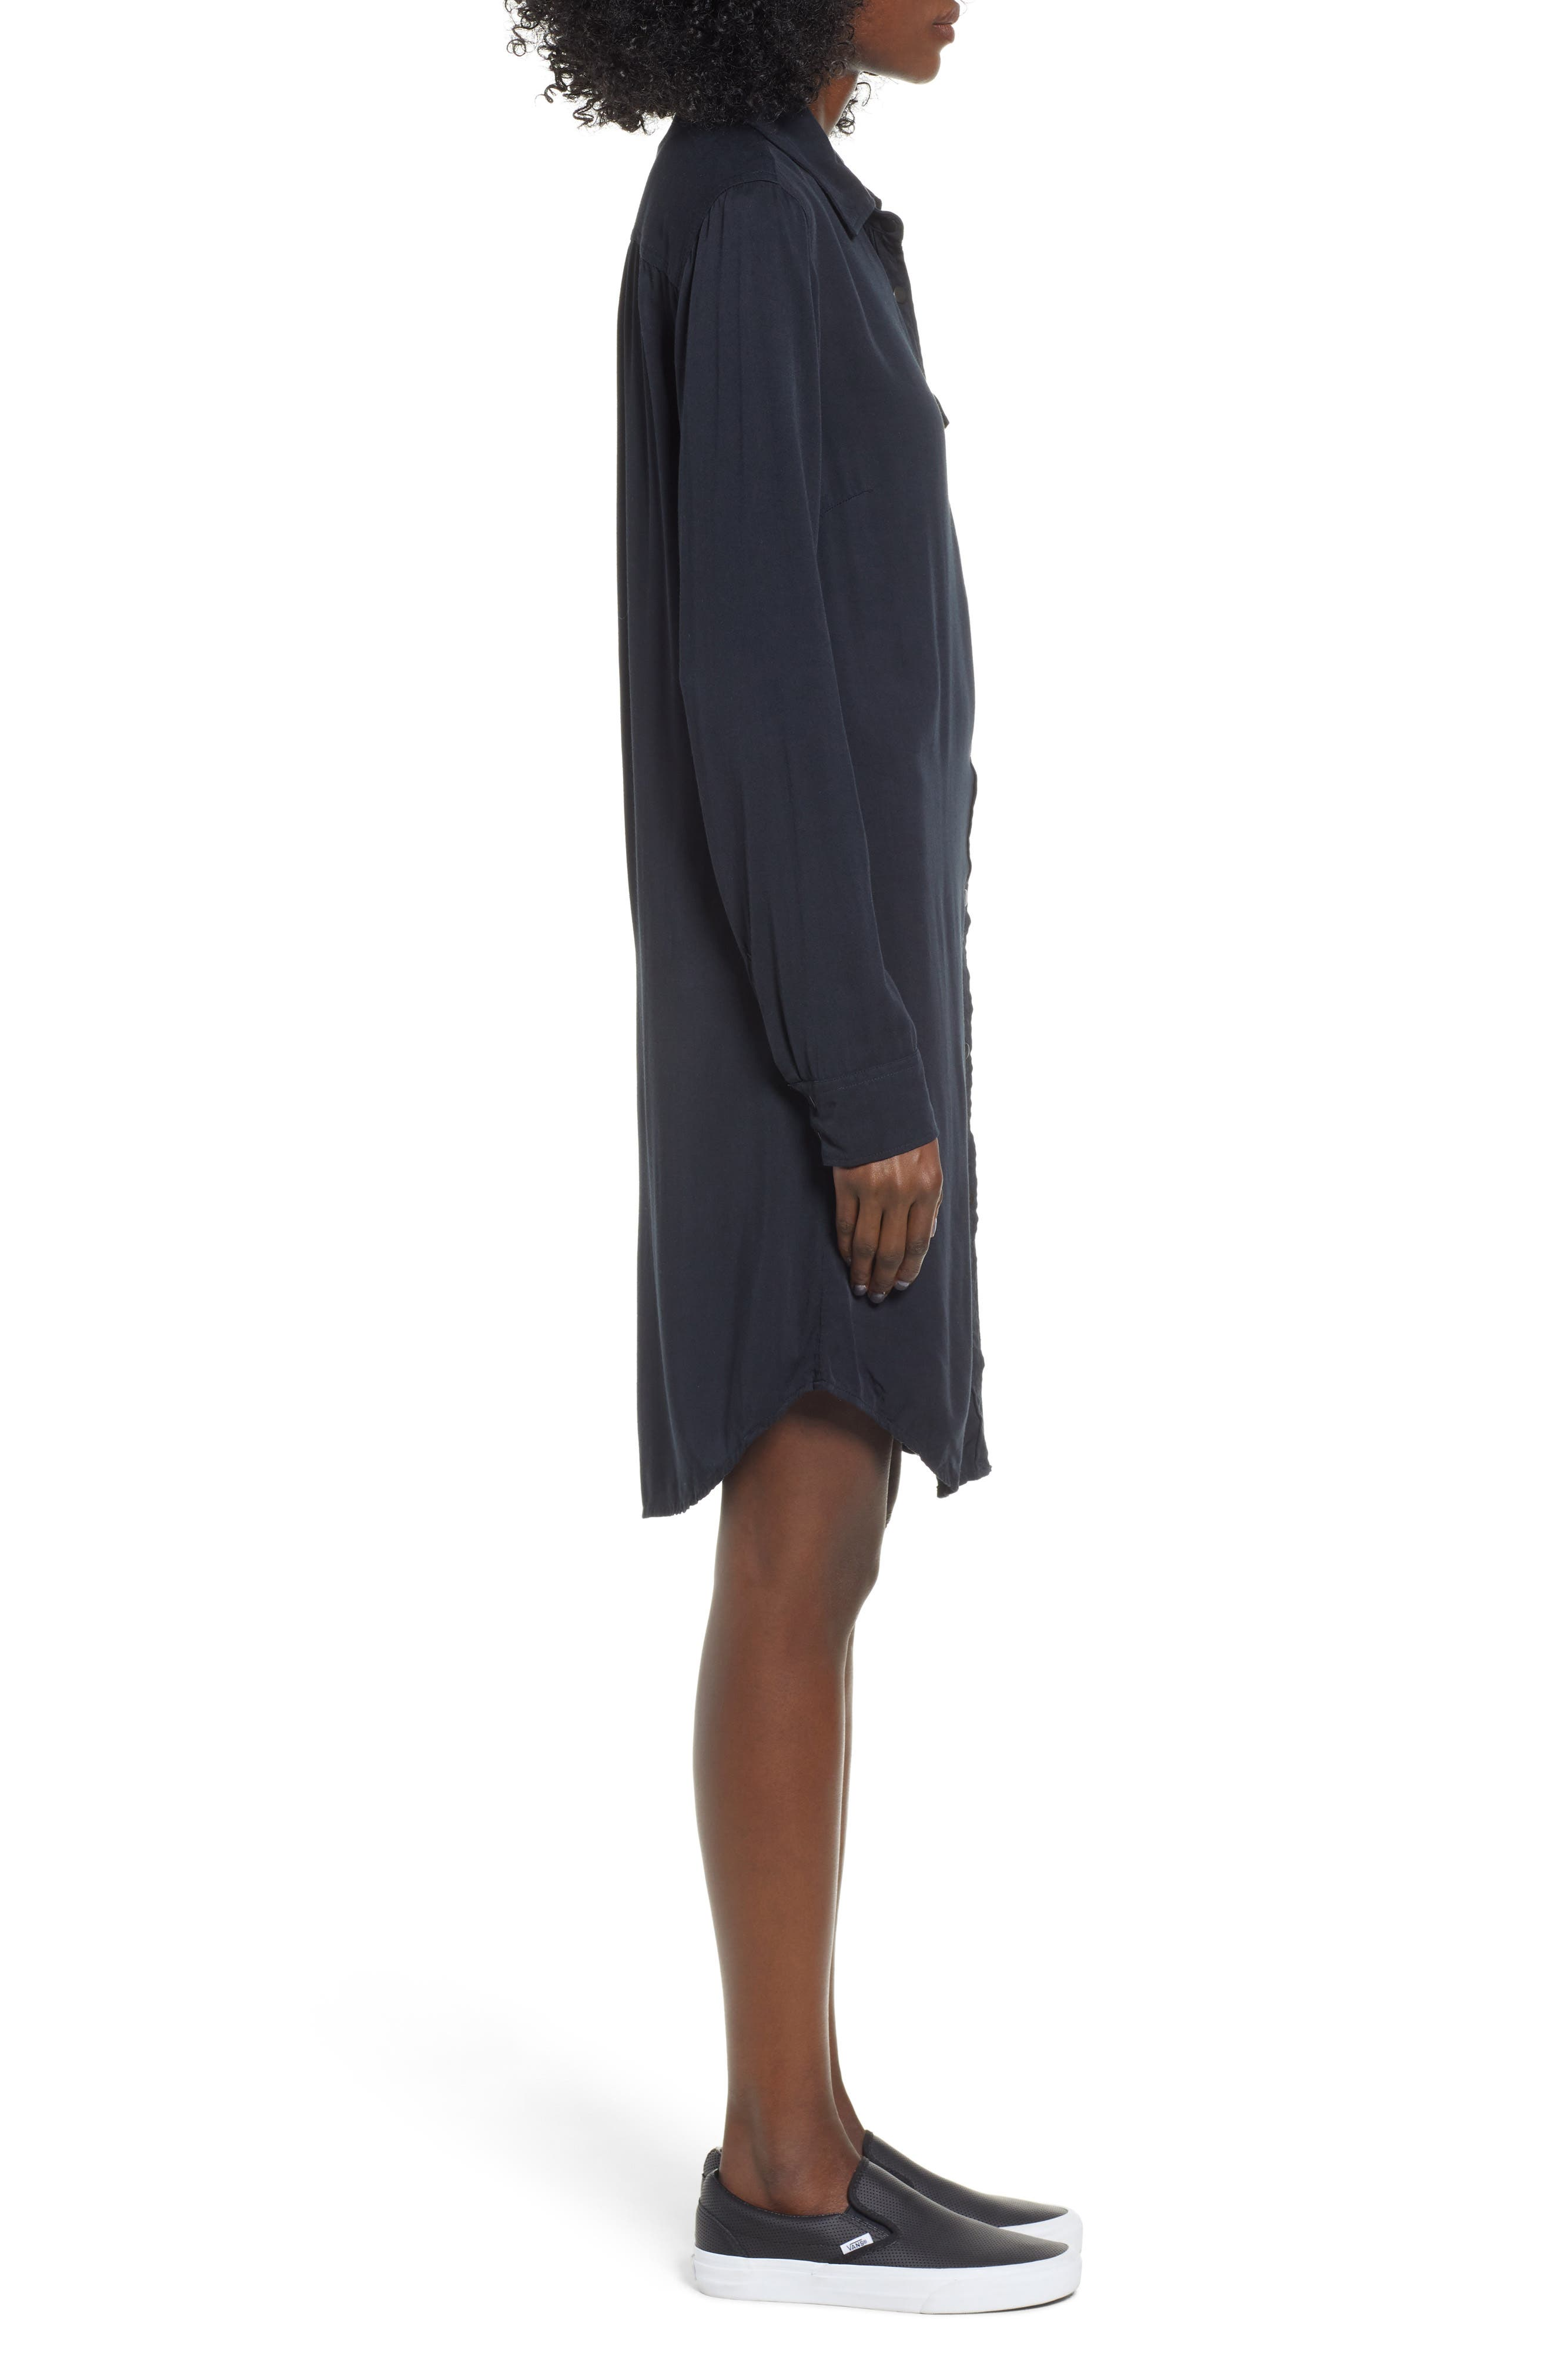 Tomini Bay View Shirtdress,                             Alternate thumbnail 3, color,                             TRUE BLACK